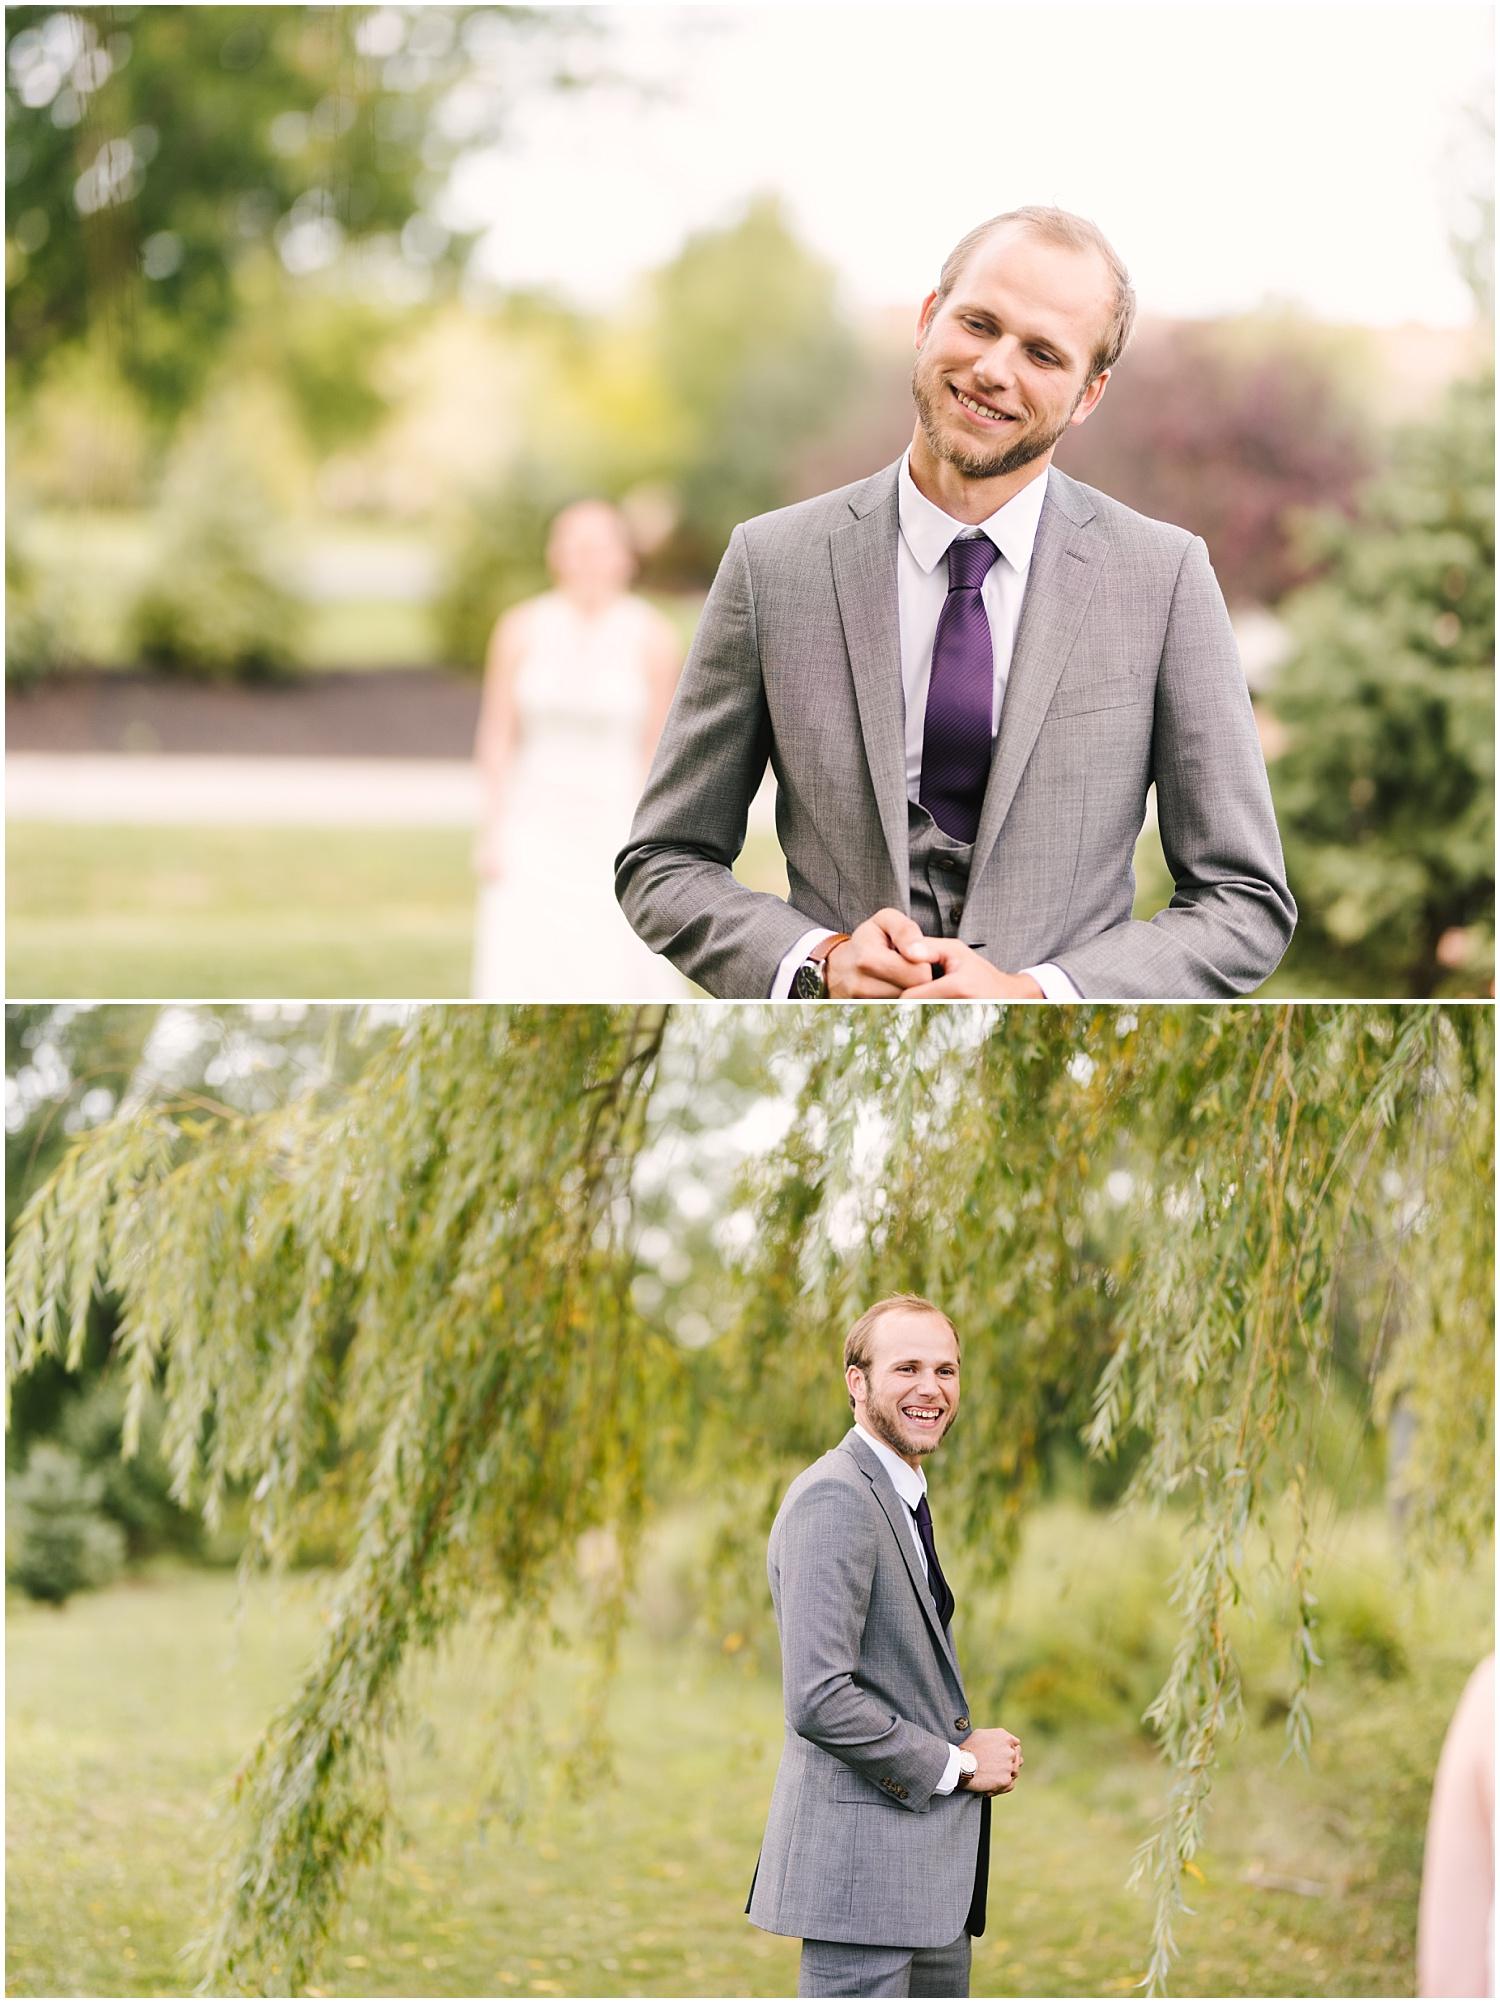 deerfield+country+club+wedding+rochester+NY+photographer (12).jpg